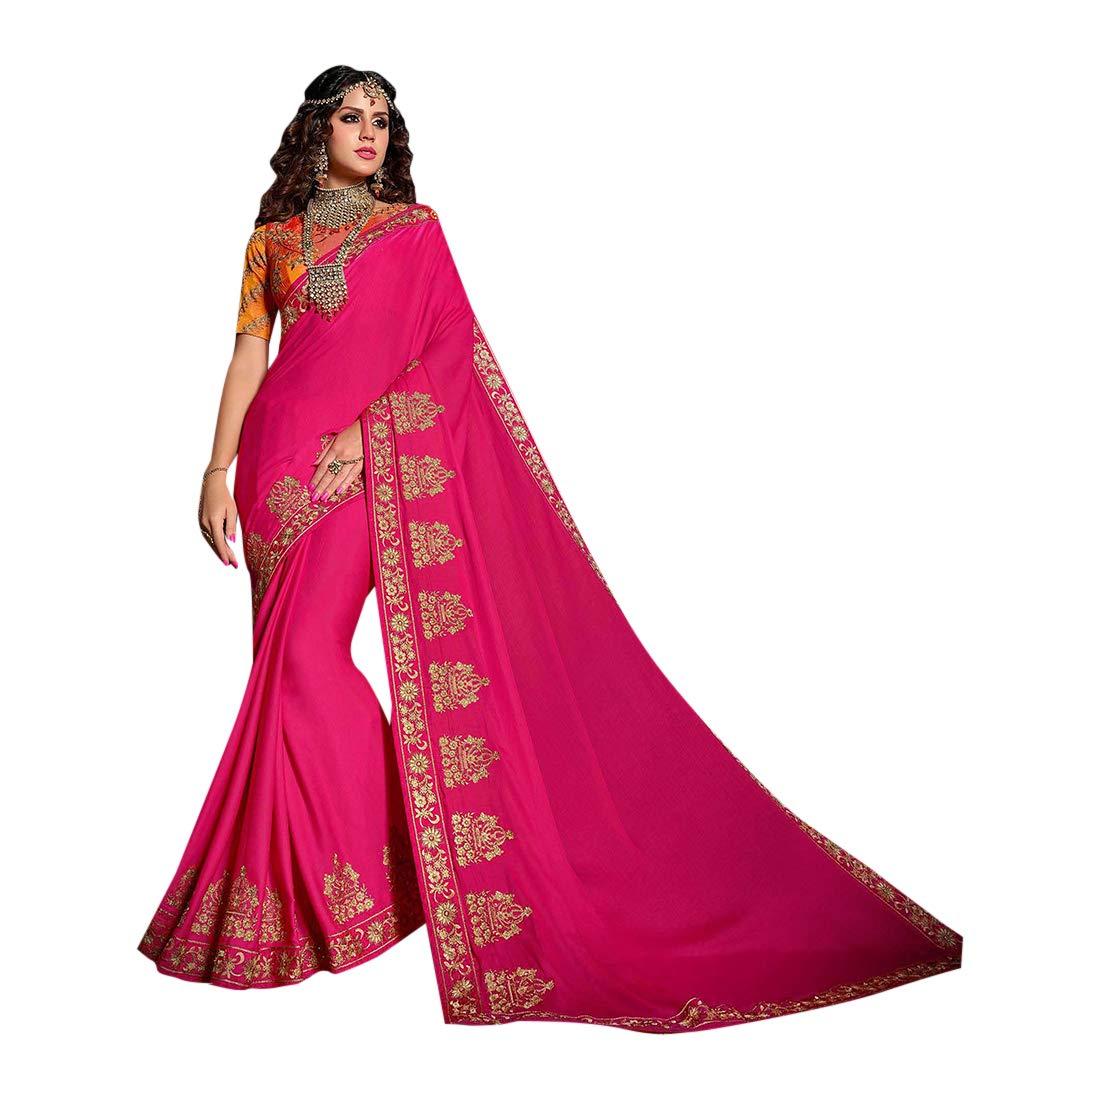 Designer Stylish Resham Silk Saree with Blouse for Women Indian Festive Party wear Sari 7559